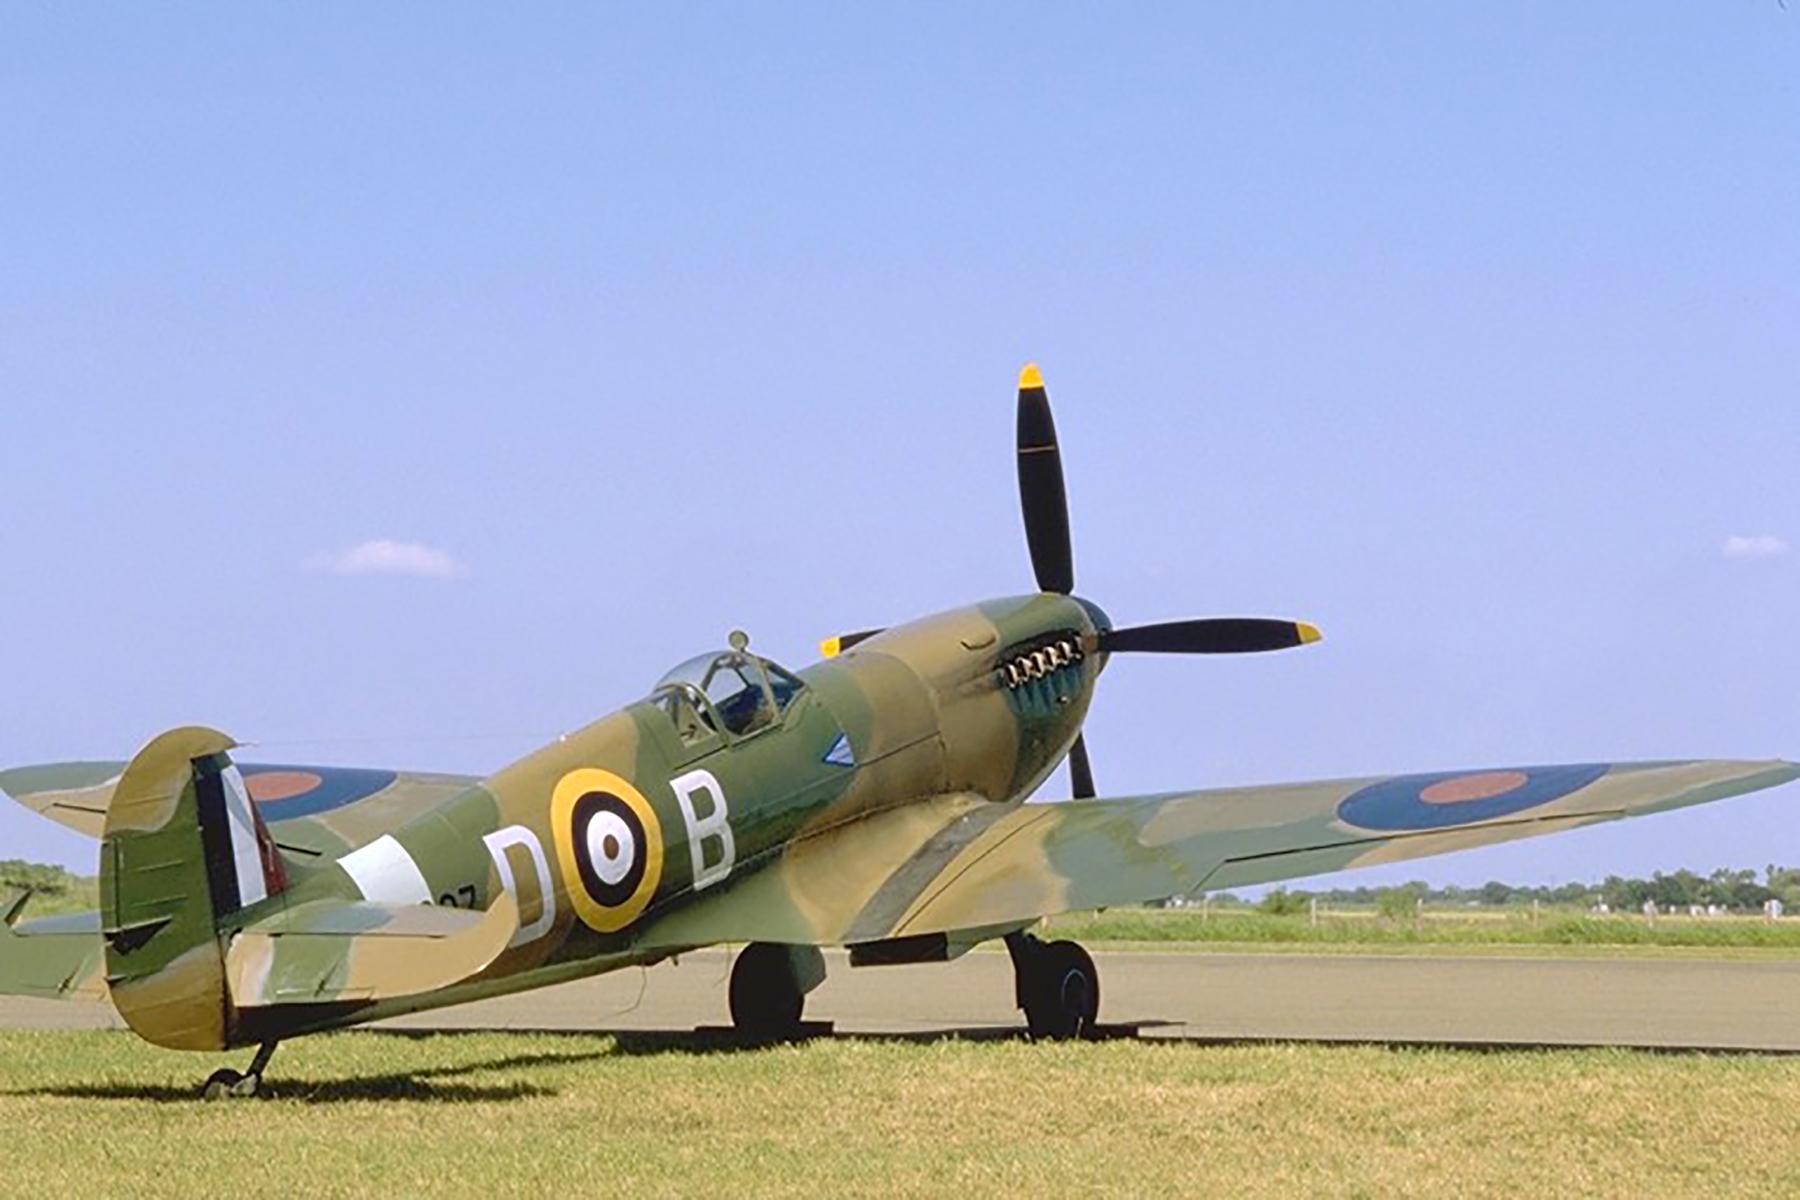 Airworthy Spitfire warbird RAF MK297 DB 01